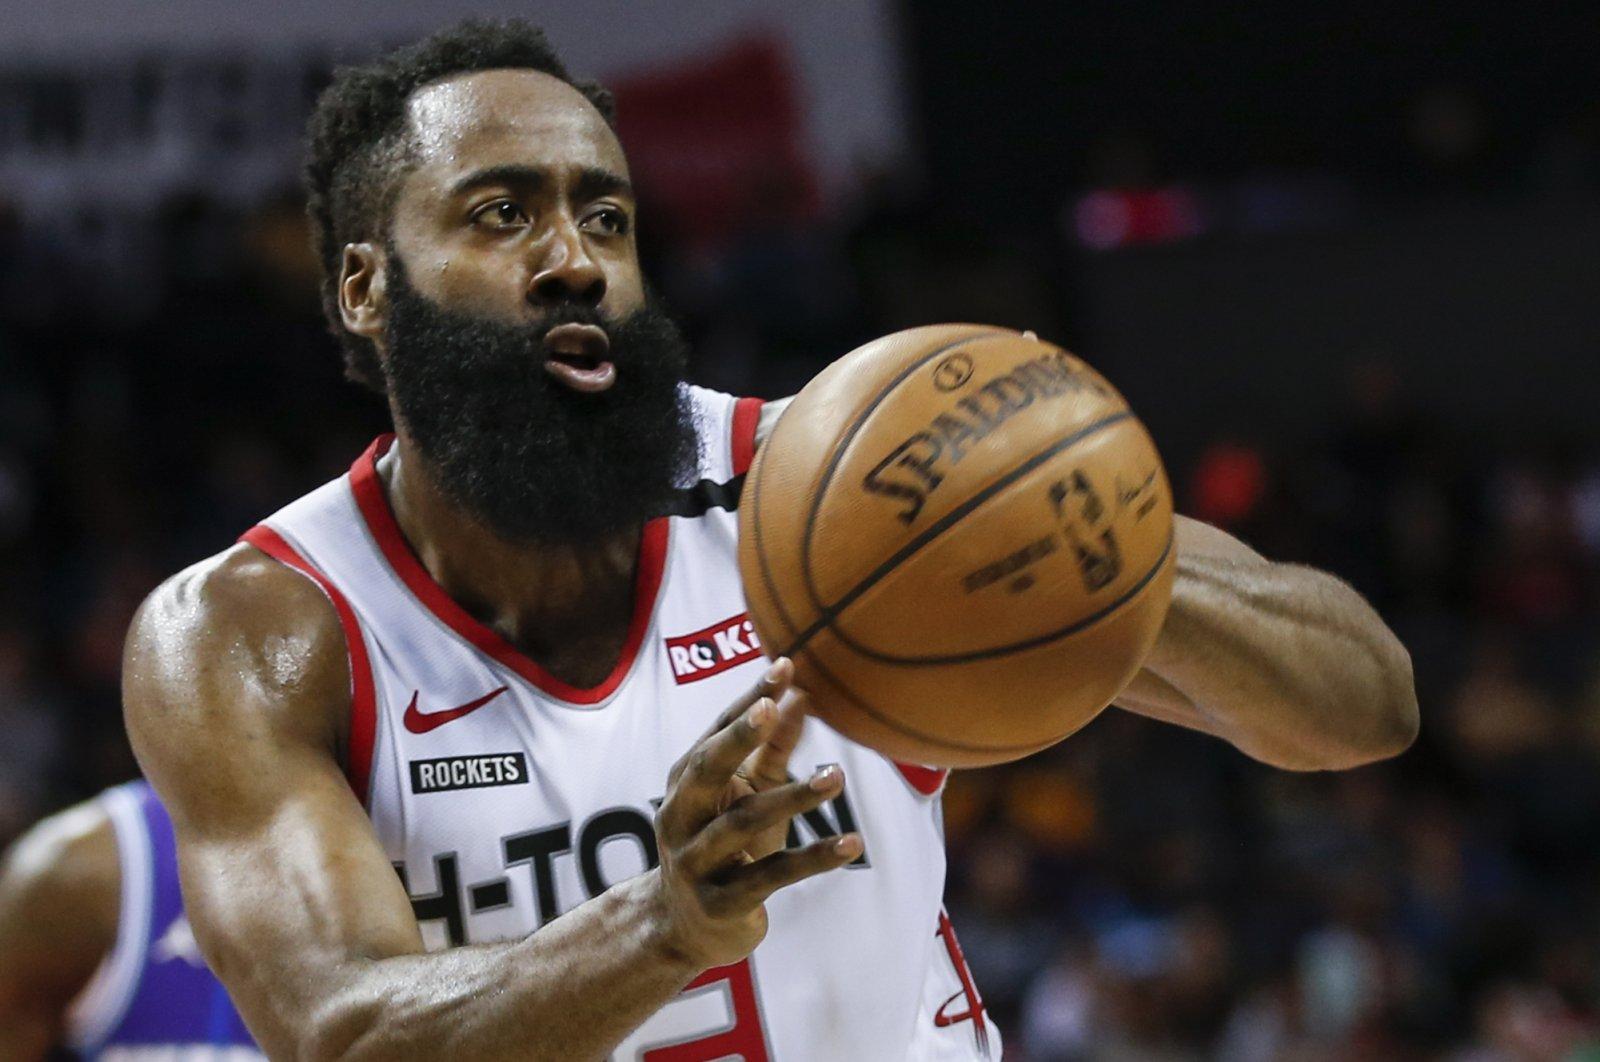 Houston Rockets' James Harden passes against the Charlotte Hornets, in Charlotte, North Carolina, U.S., March 7, 2020. (AP Photo)